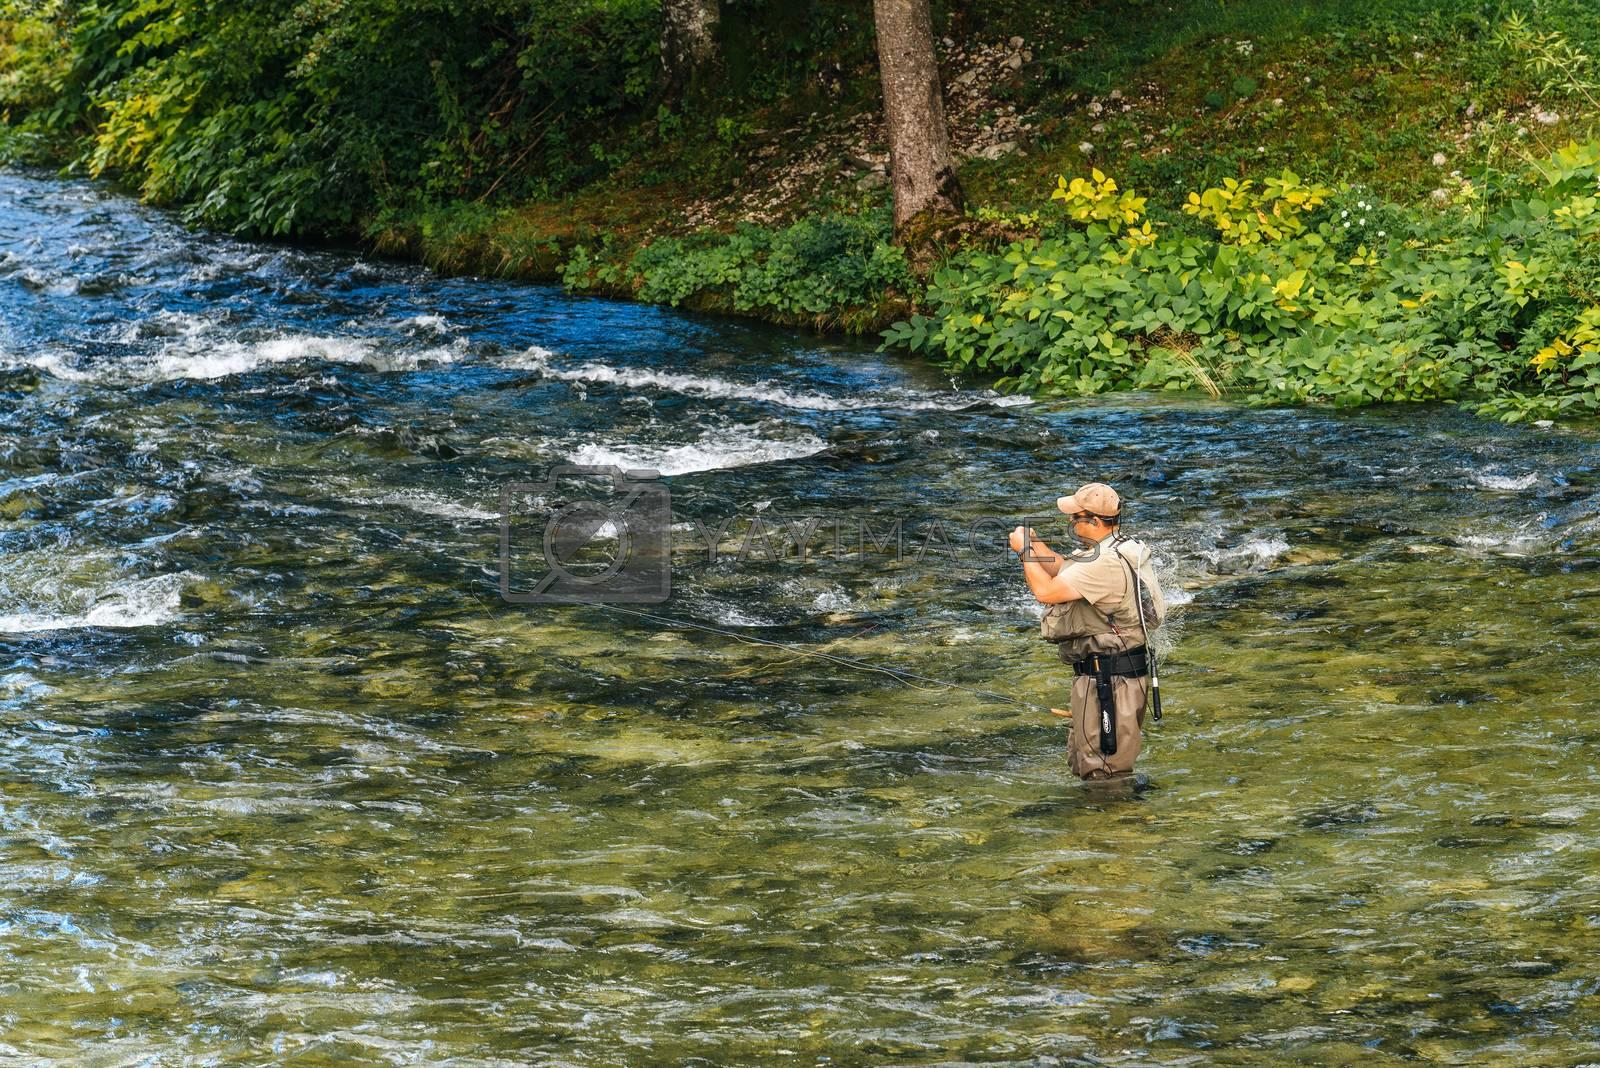 Unidentifiable man fishing at Jezernica river, Bohinj Lake by stevanovicigor